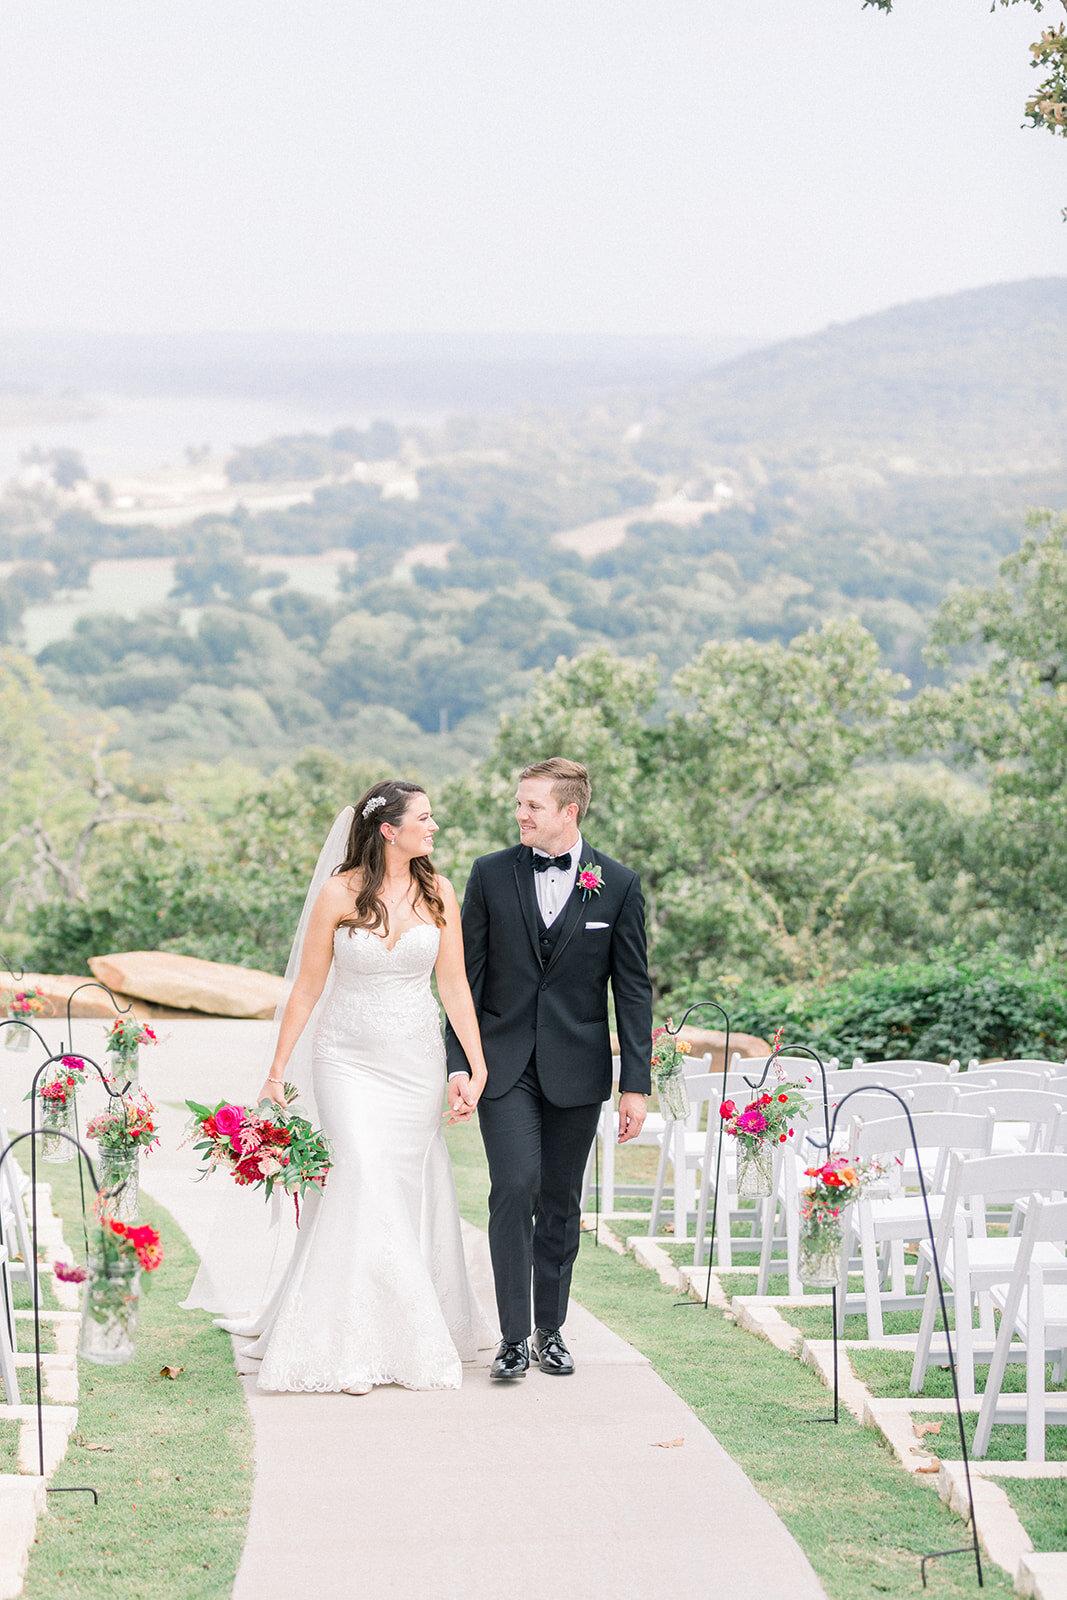 Elegant Formal Wedding Venue in Tulsa — Dream Point Ranch